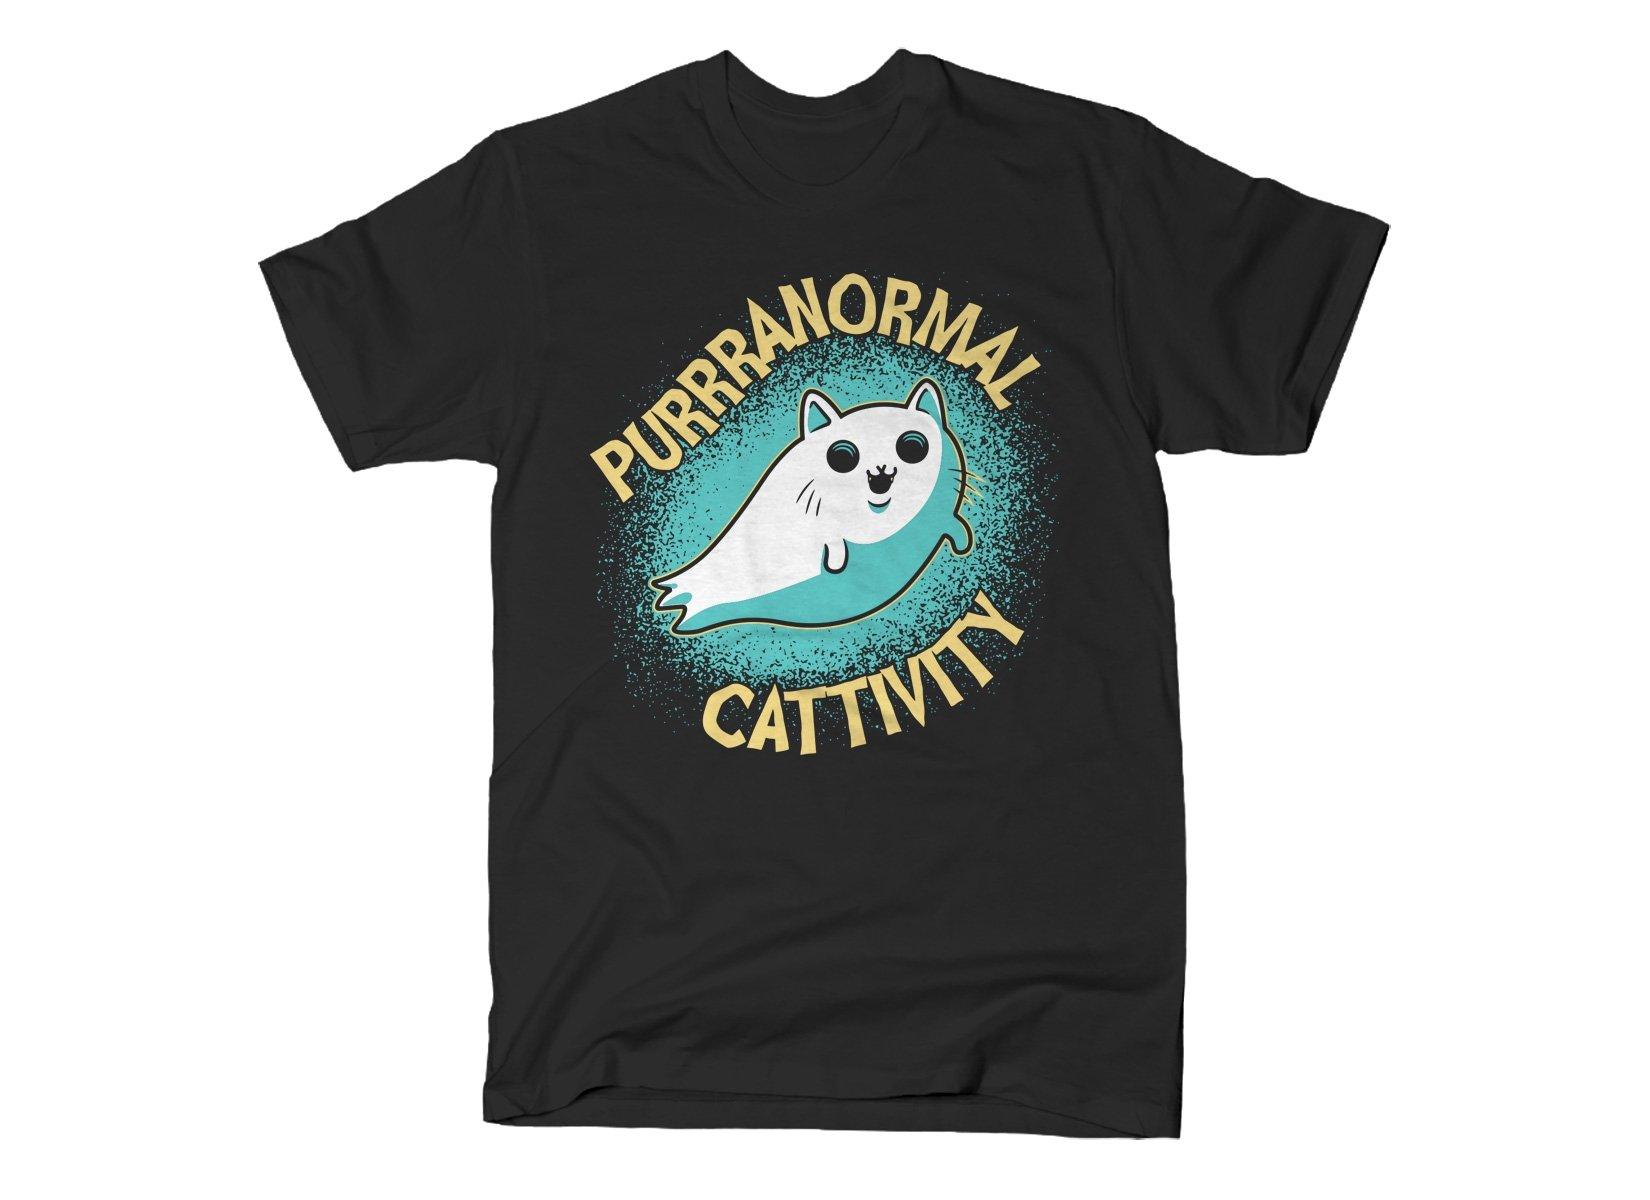 Purrranormal Cattivity